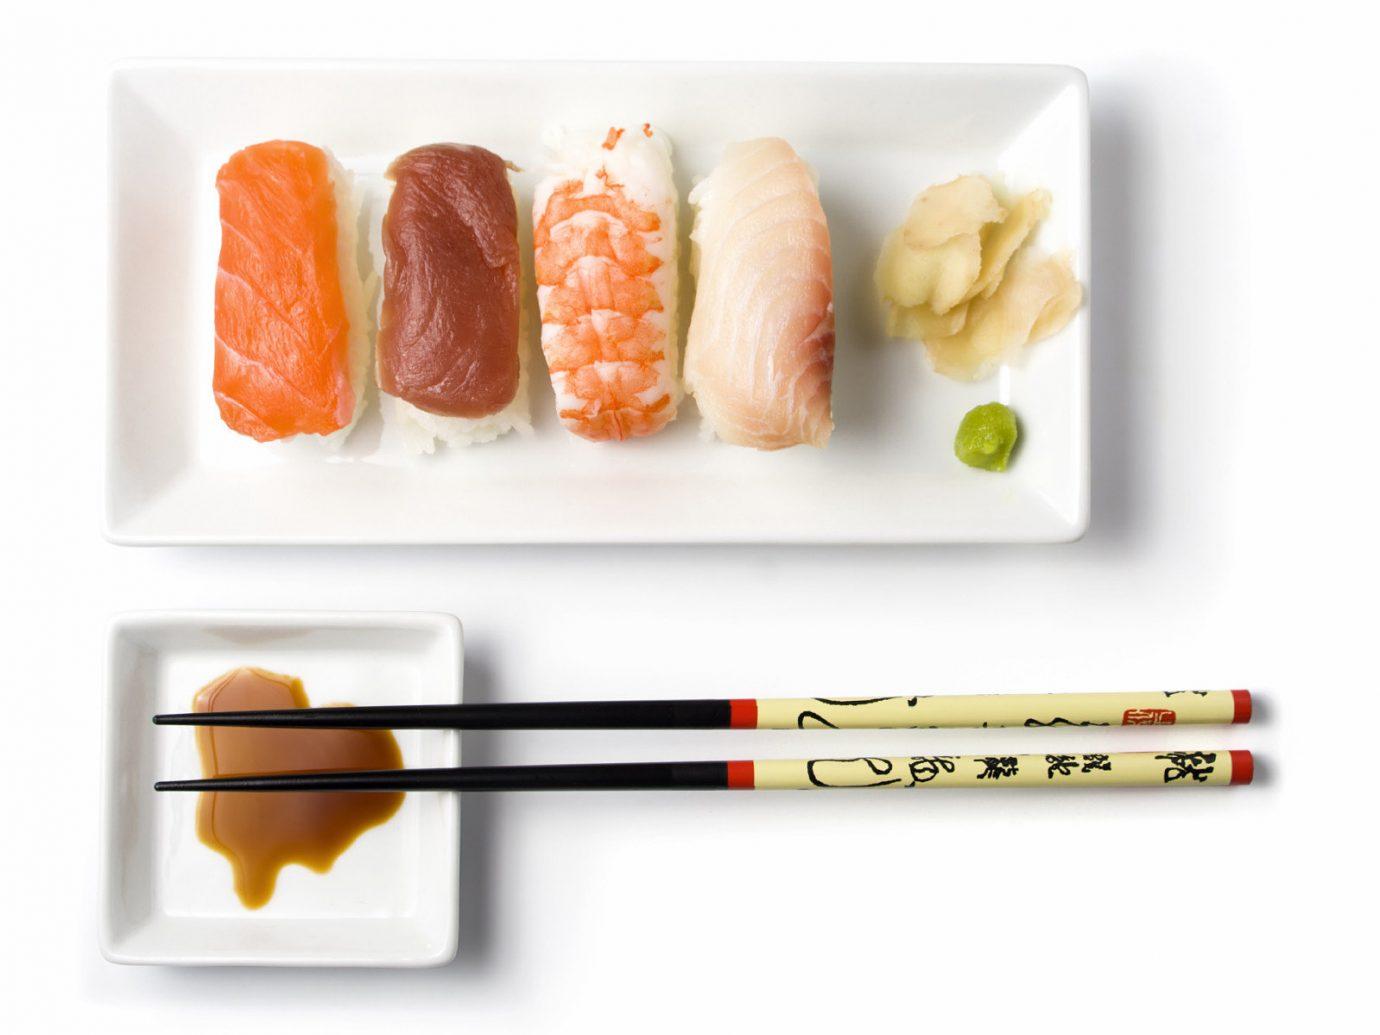 Trip Ideas food dish cuisine product asian food meat